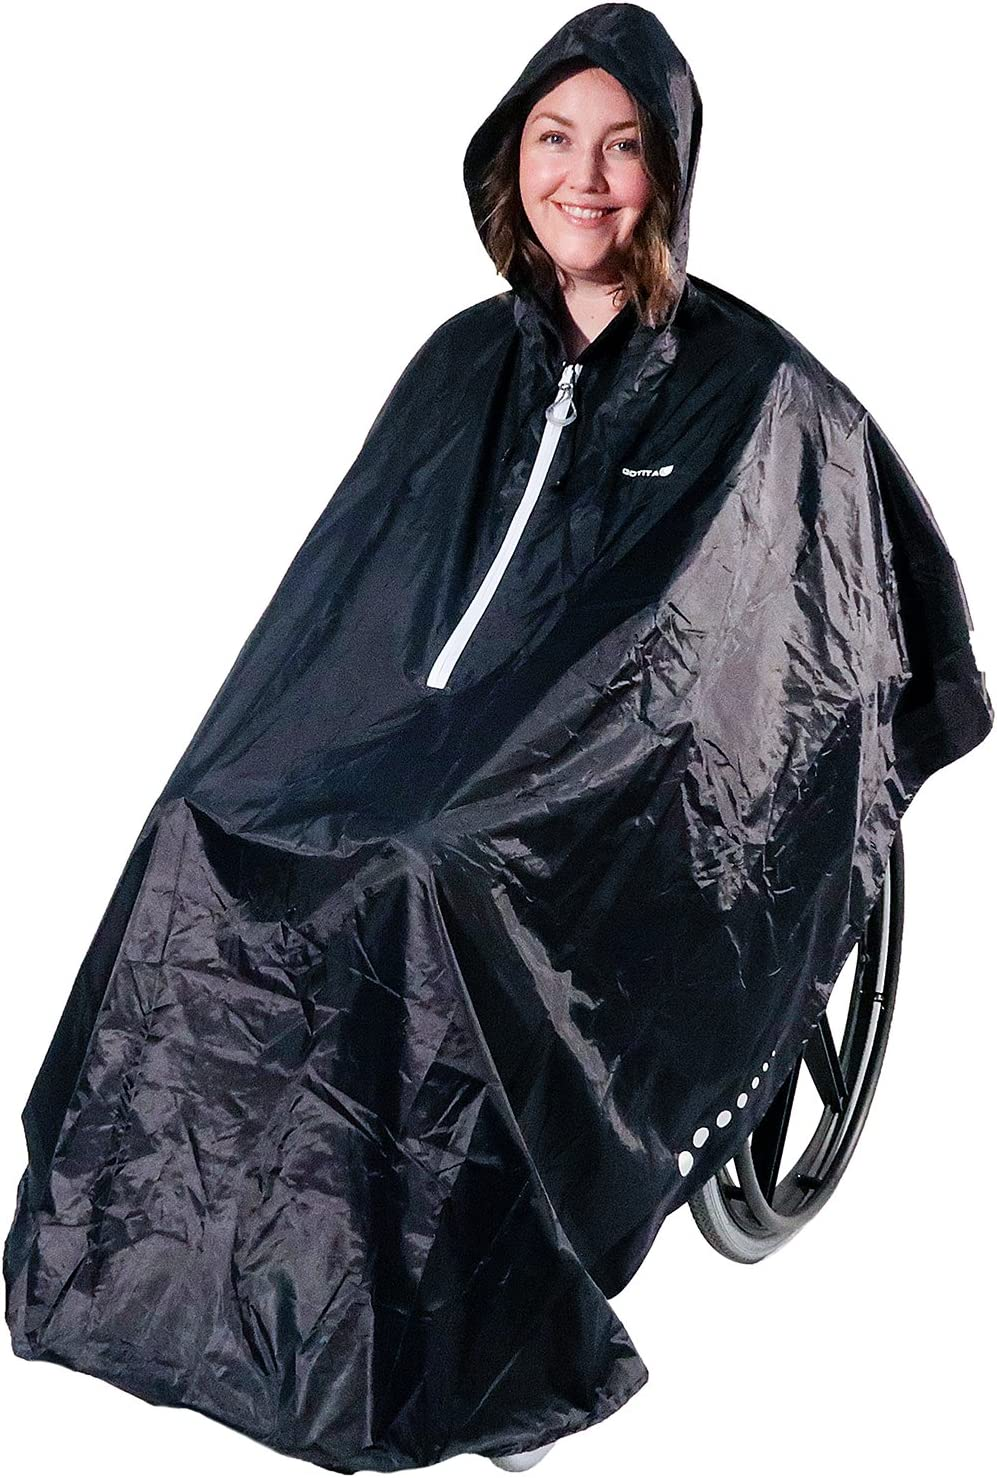 GOTITA – Poncho Impermeable para Silla de Ruedas – Chubasquero Universal – Capa de Lluvia para Silla de Ruedas fácil de Usar. Poncho de diseño Italiano